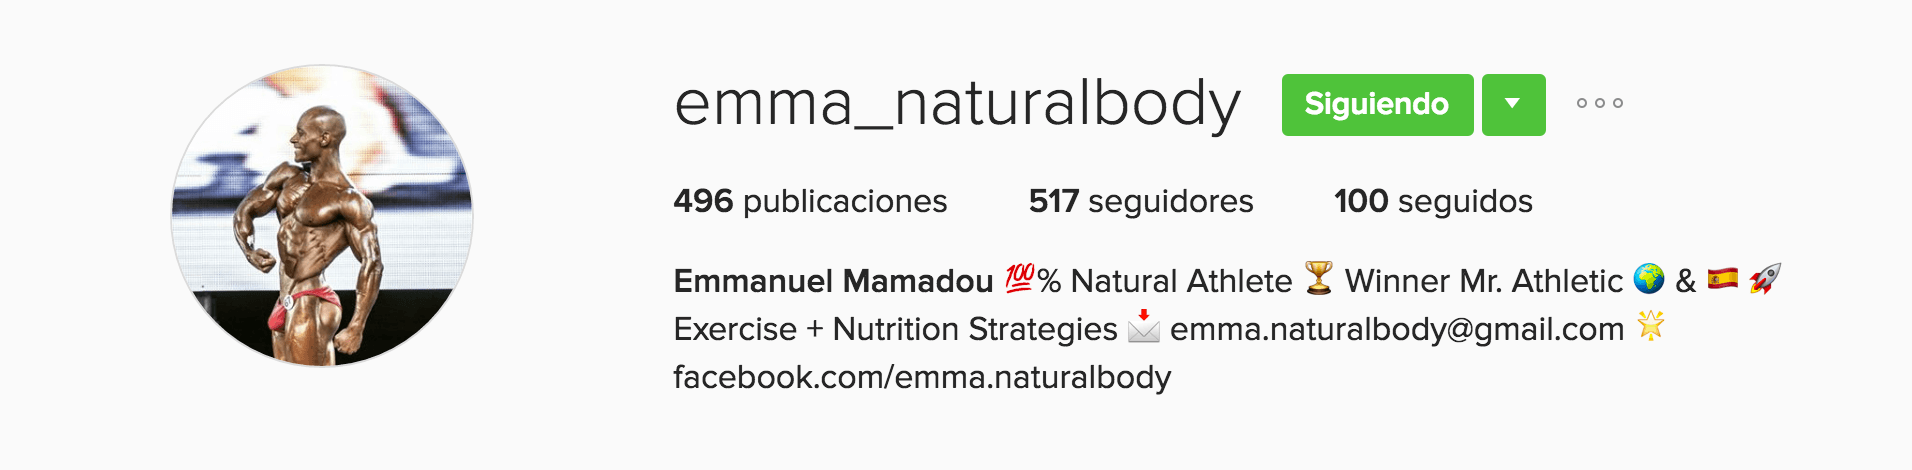 emma_naturalbody usos de instagram para empresas